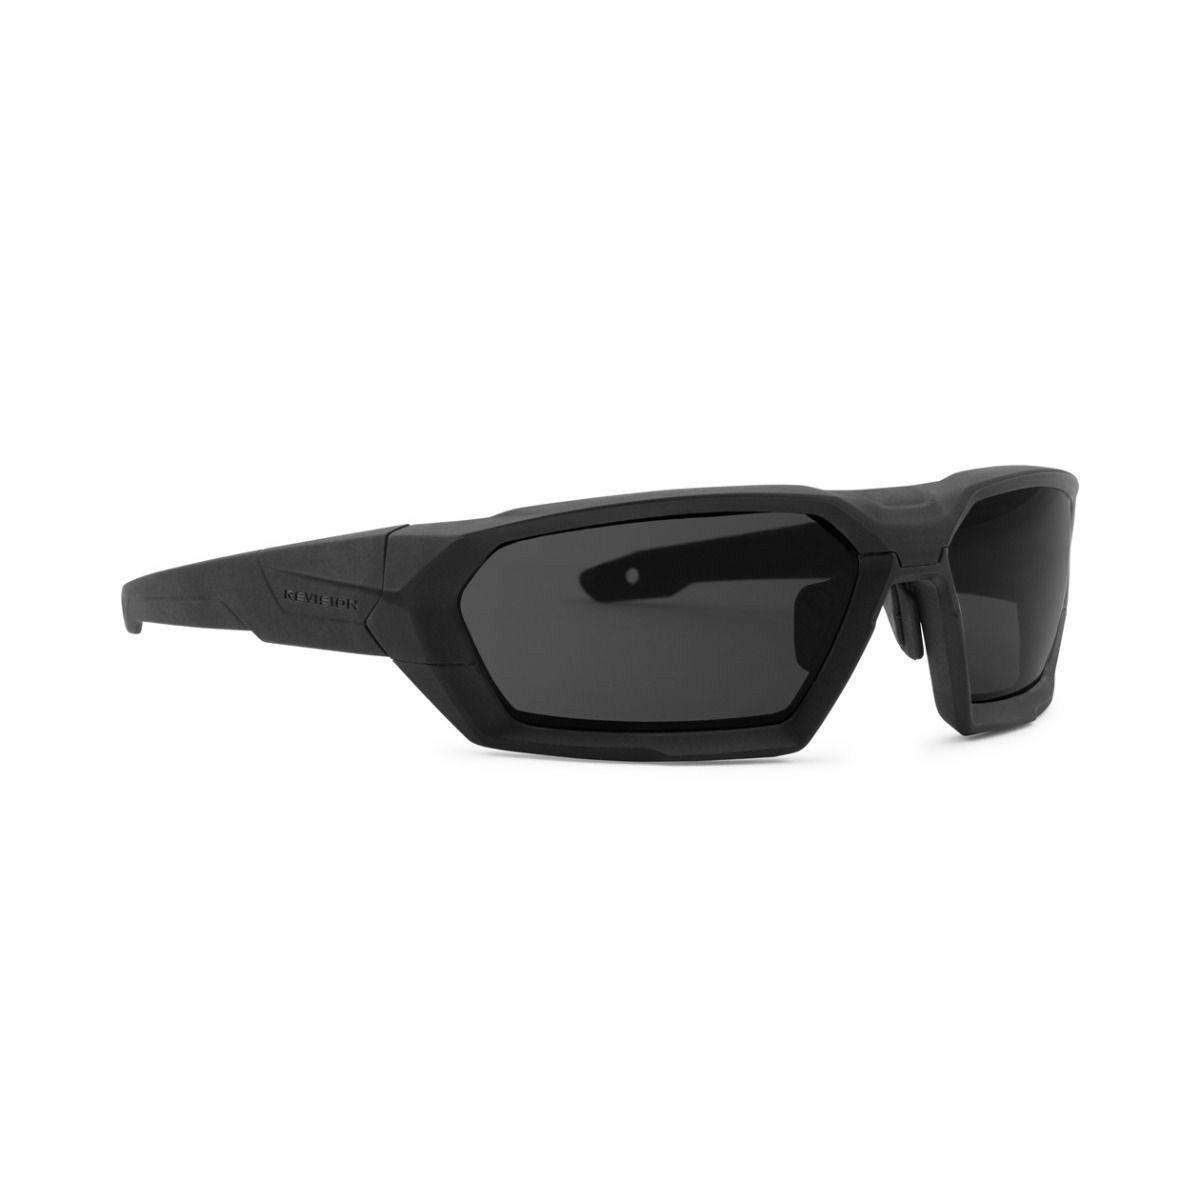 Glasses photochromic anti fog shadow strike